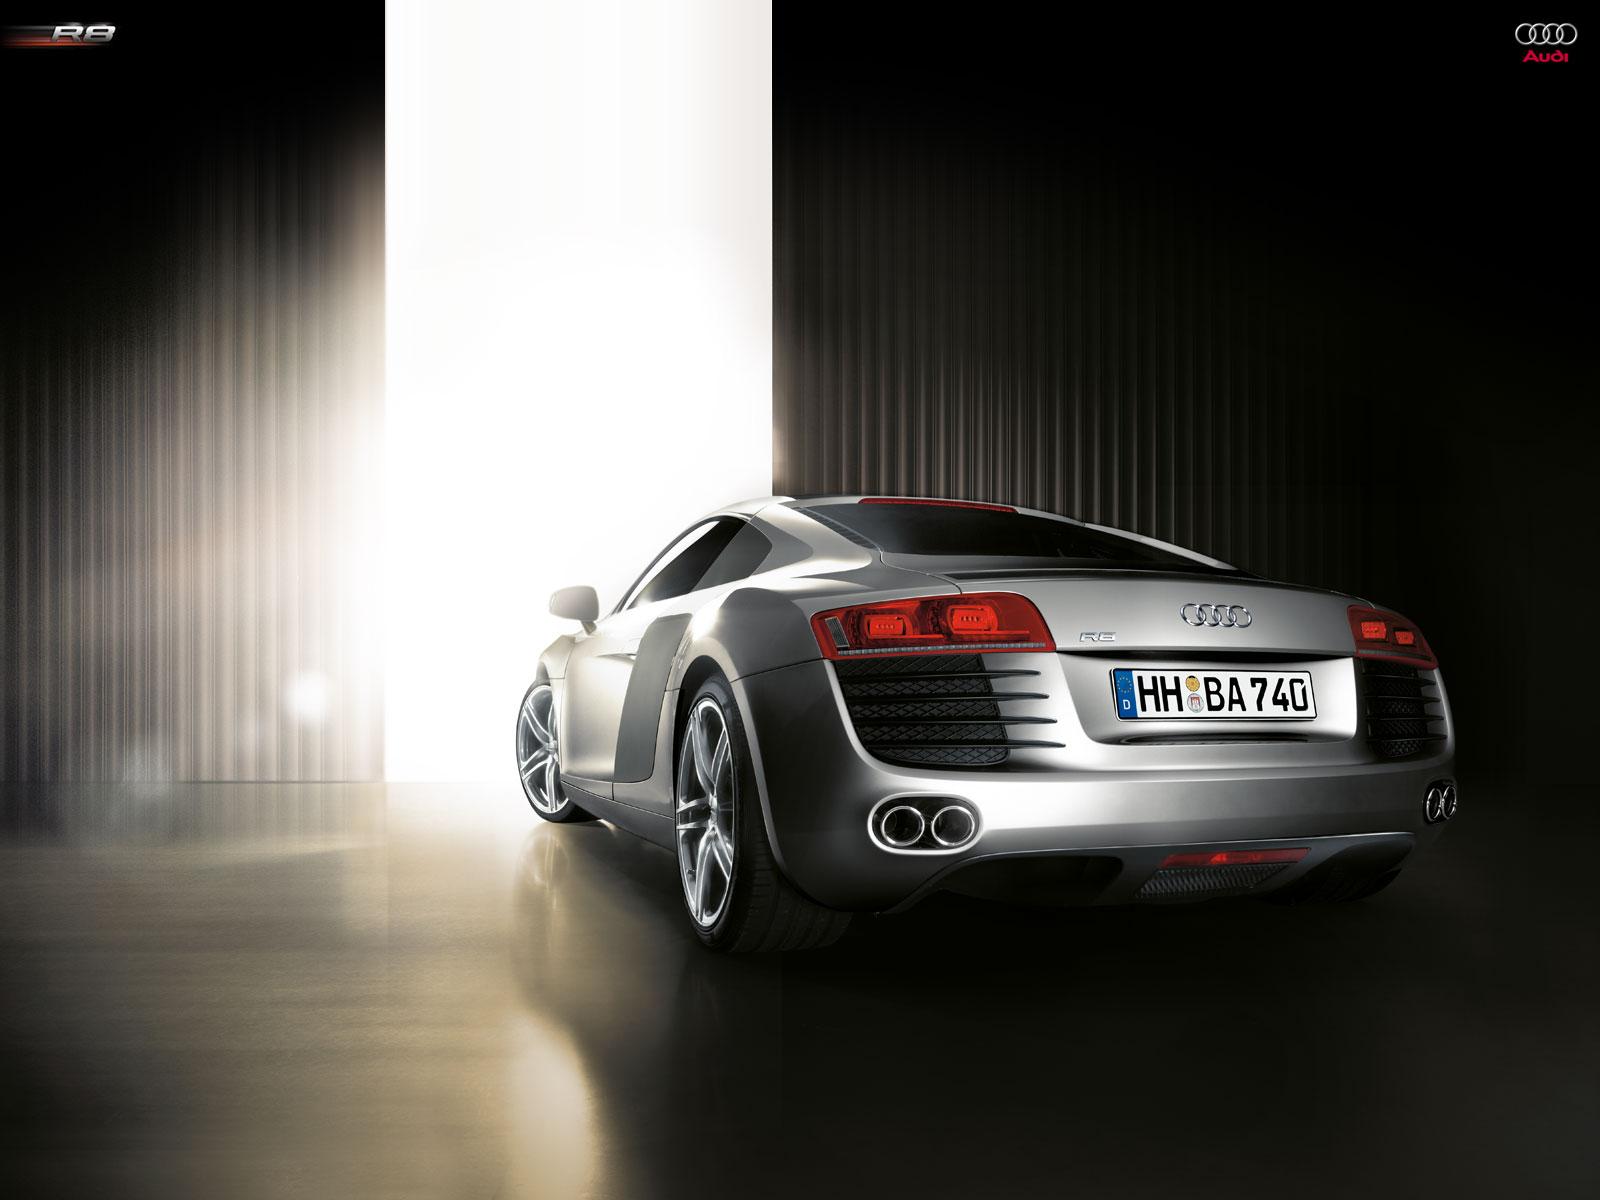 http://3.bp.blogspot.com/-H1M4Ugl49Co/TlC3SH6_NsI/AAAAAAAABWg/0PO_qY0tDjw/s1600/HD+Cars+Wallpapers+%252814%2529.jpg